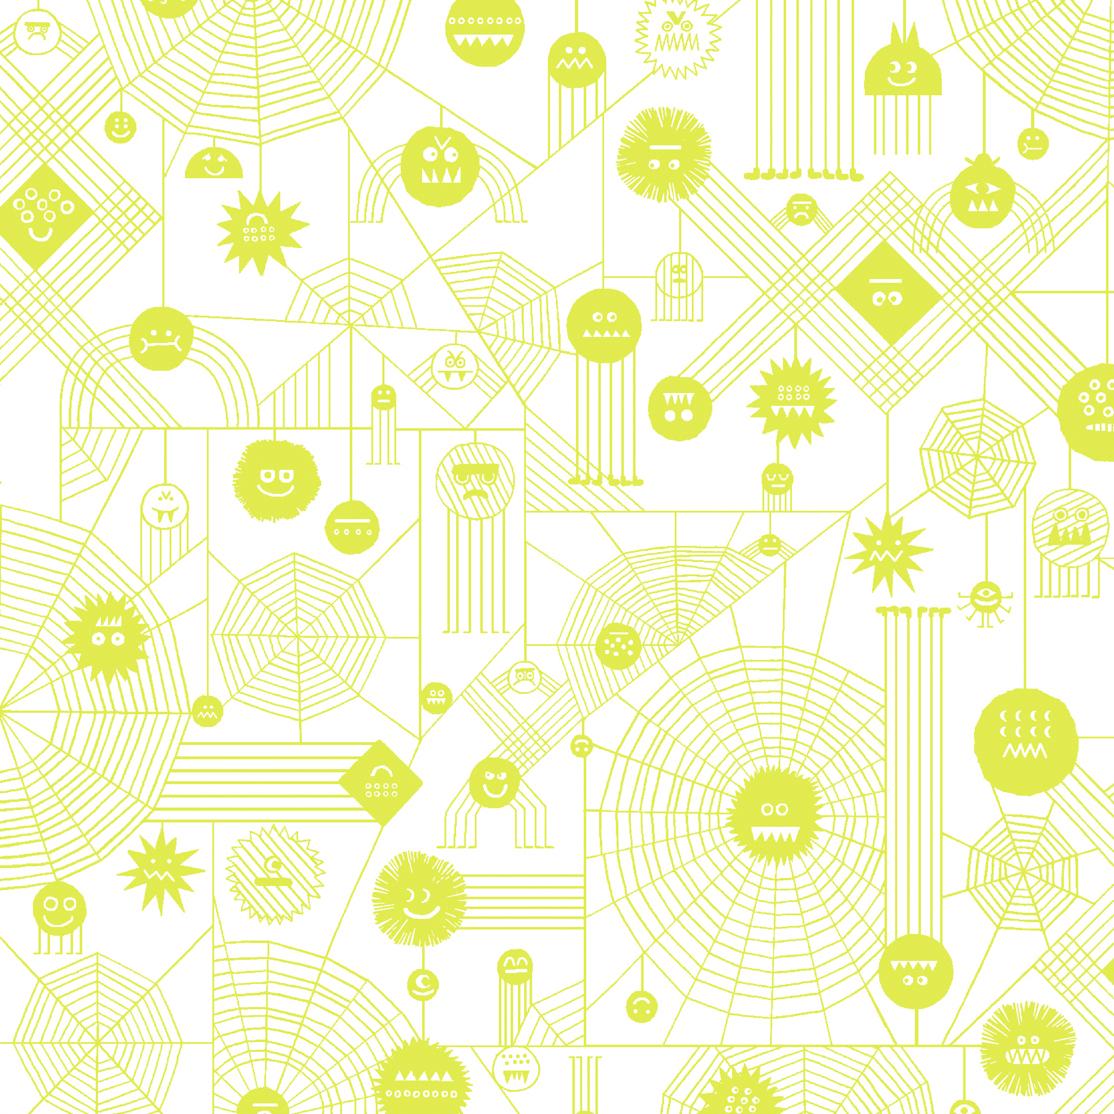 Rob Hodgson Across the Universe - Web Attack (Neon Yellow)